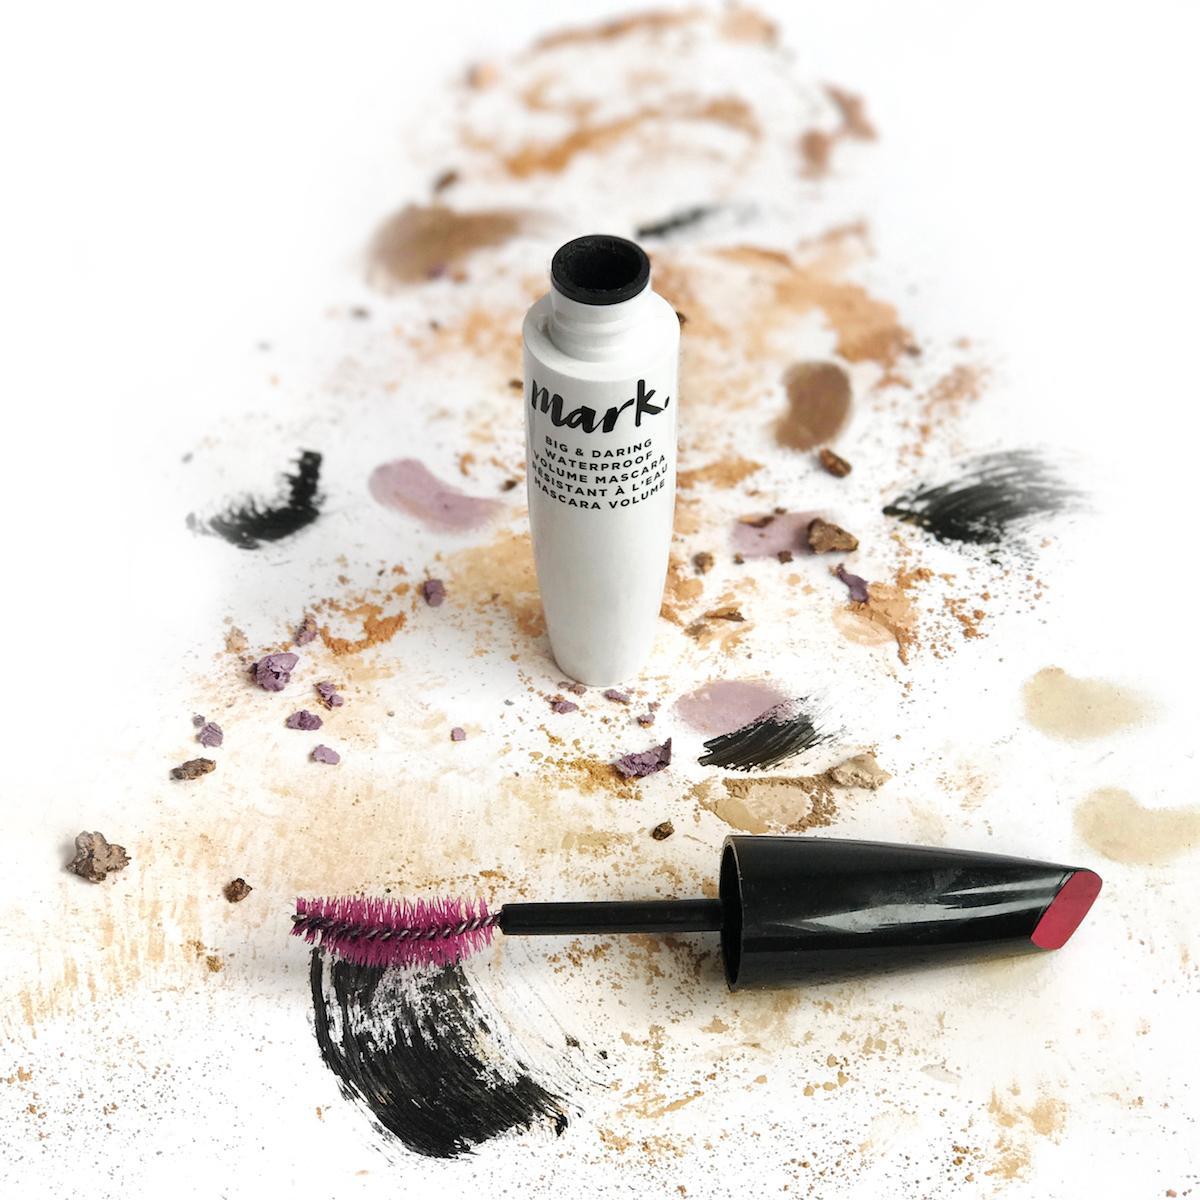 Avon Mark Avon Mark Big & Daring Volume Mascara Waterproof Beautyfullblog